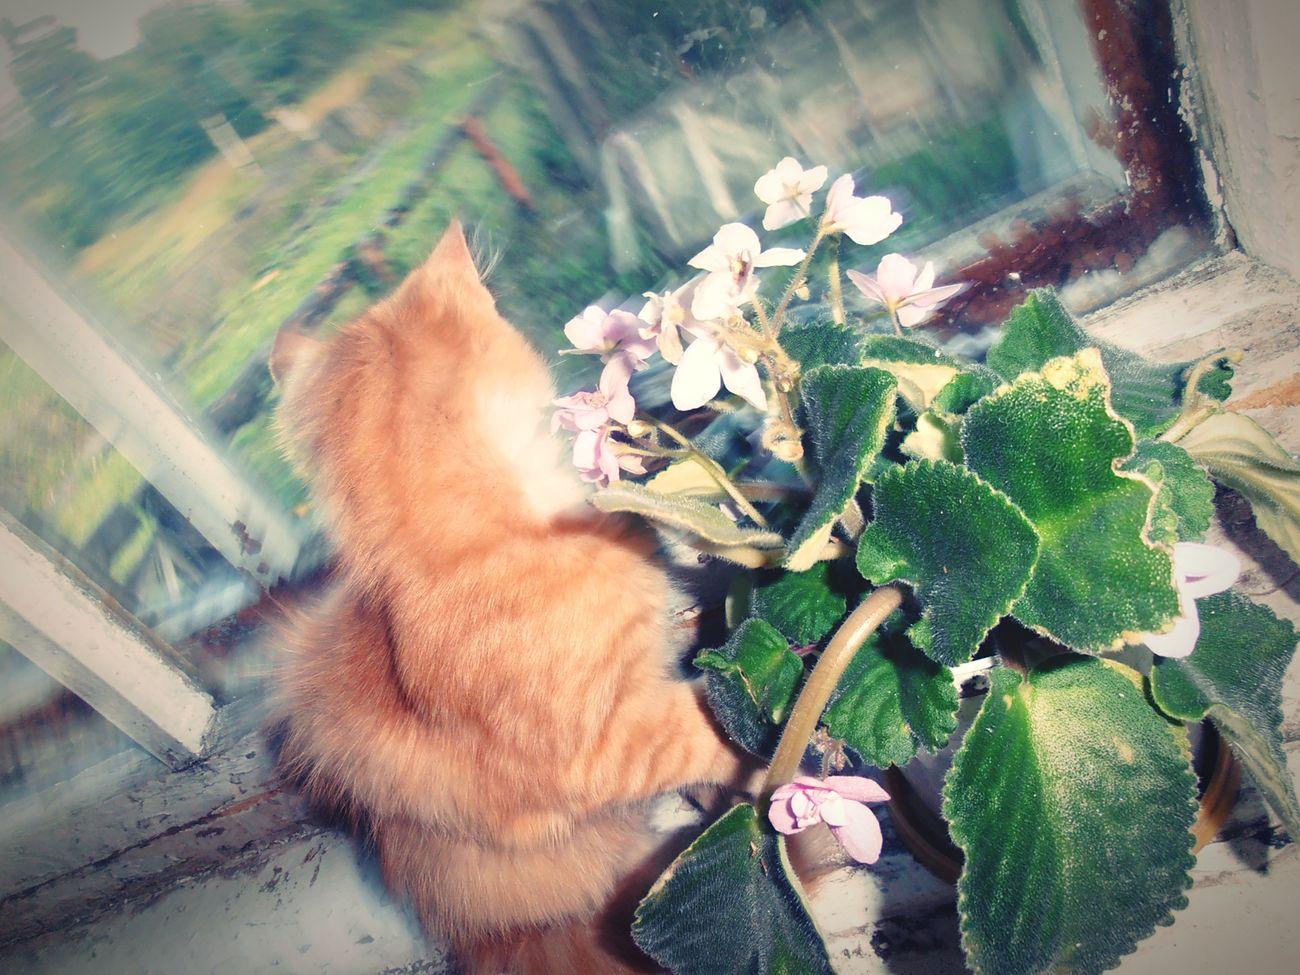 Рыжик и фиалка..Cats 🐱 Kitty Animal_collection Animalphotography рыжий кот Getting Creative котики😻 котик❤️ любимый кот